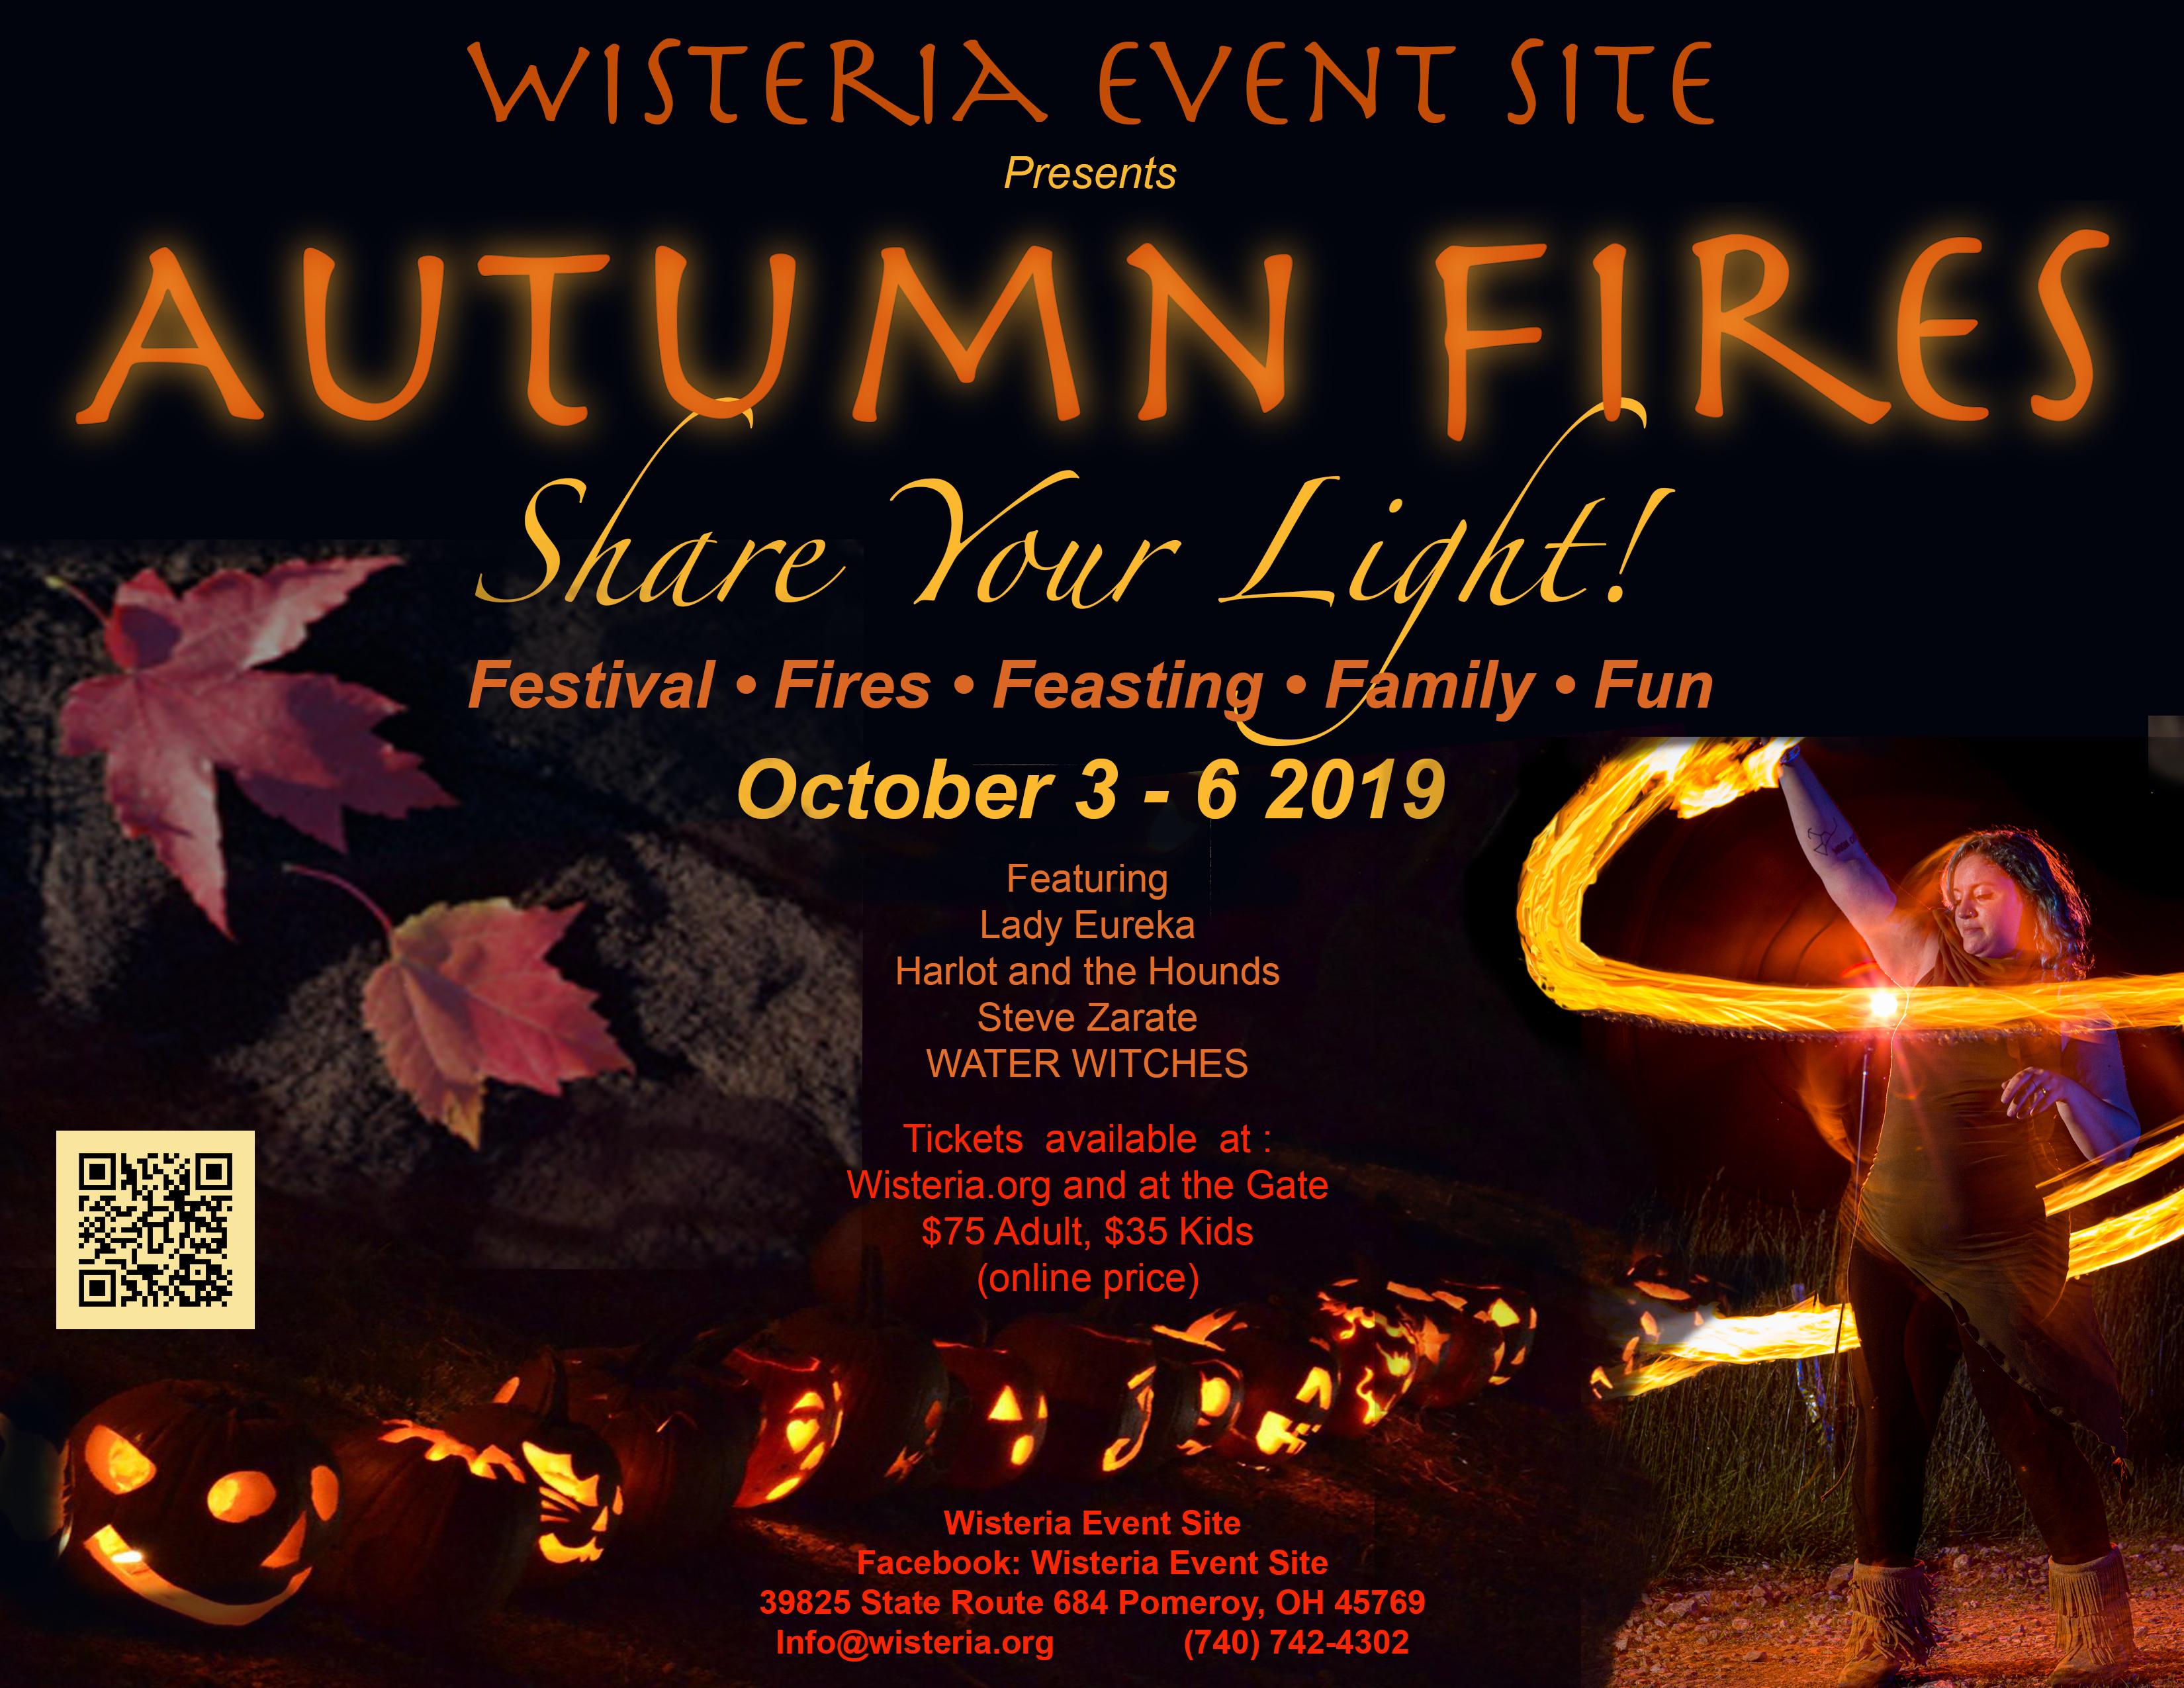 Autumn Fires flier